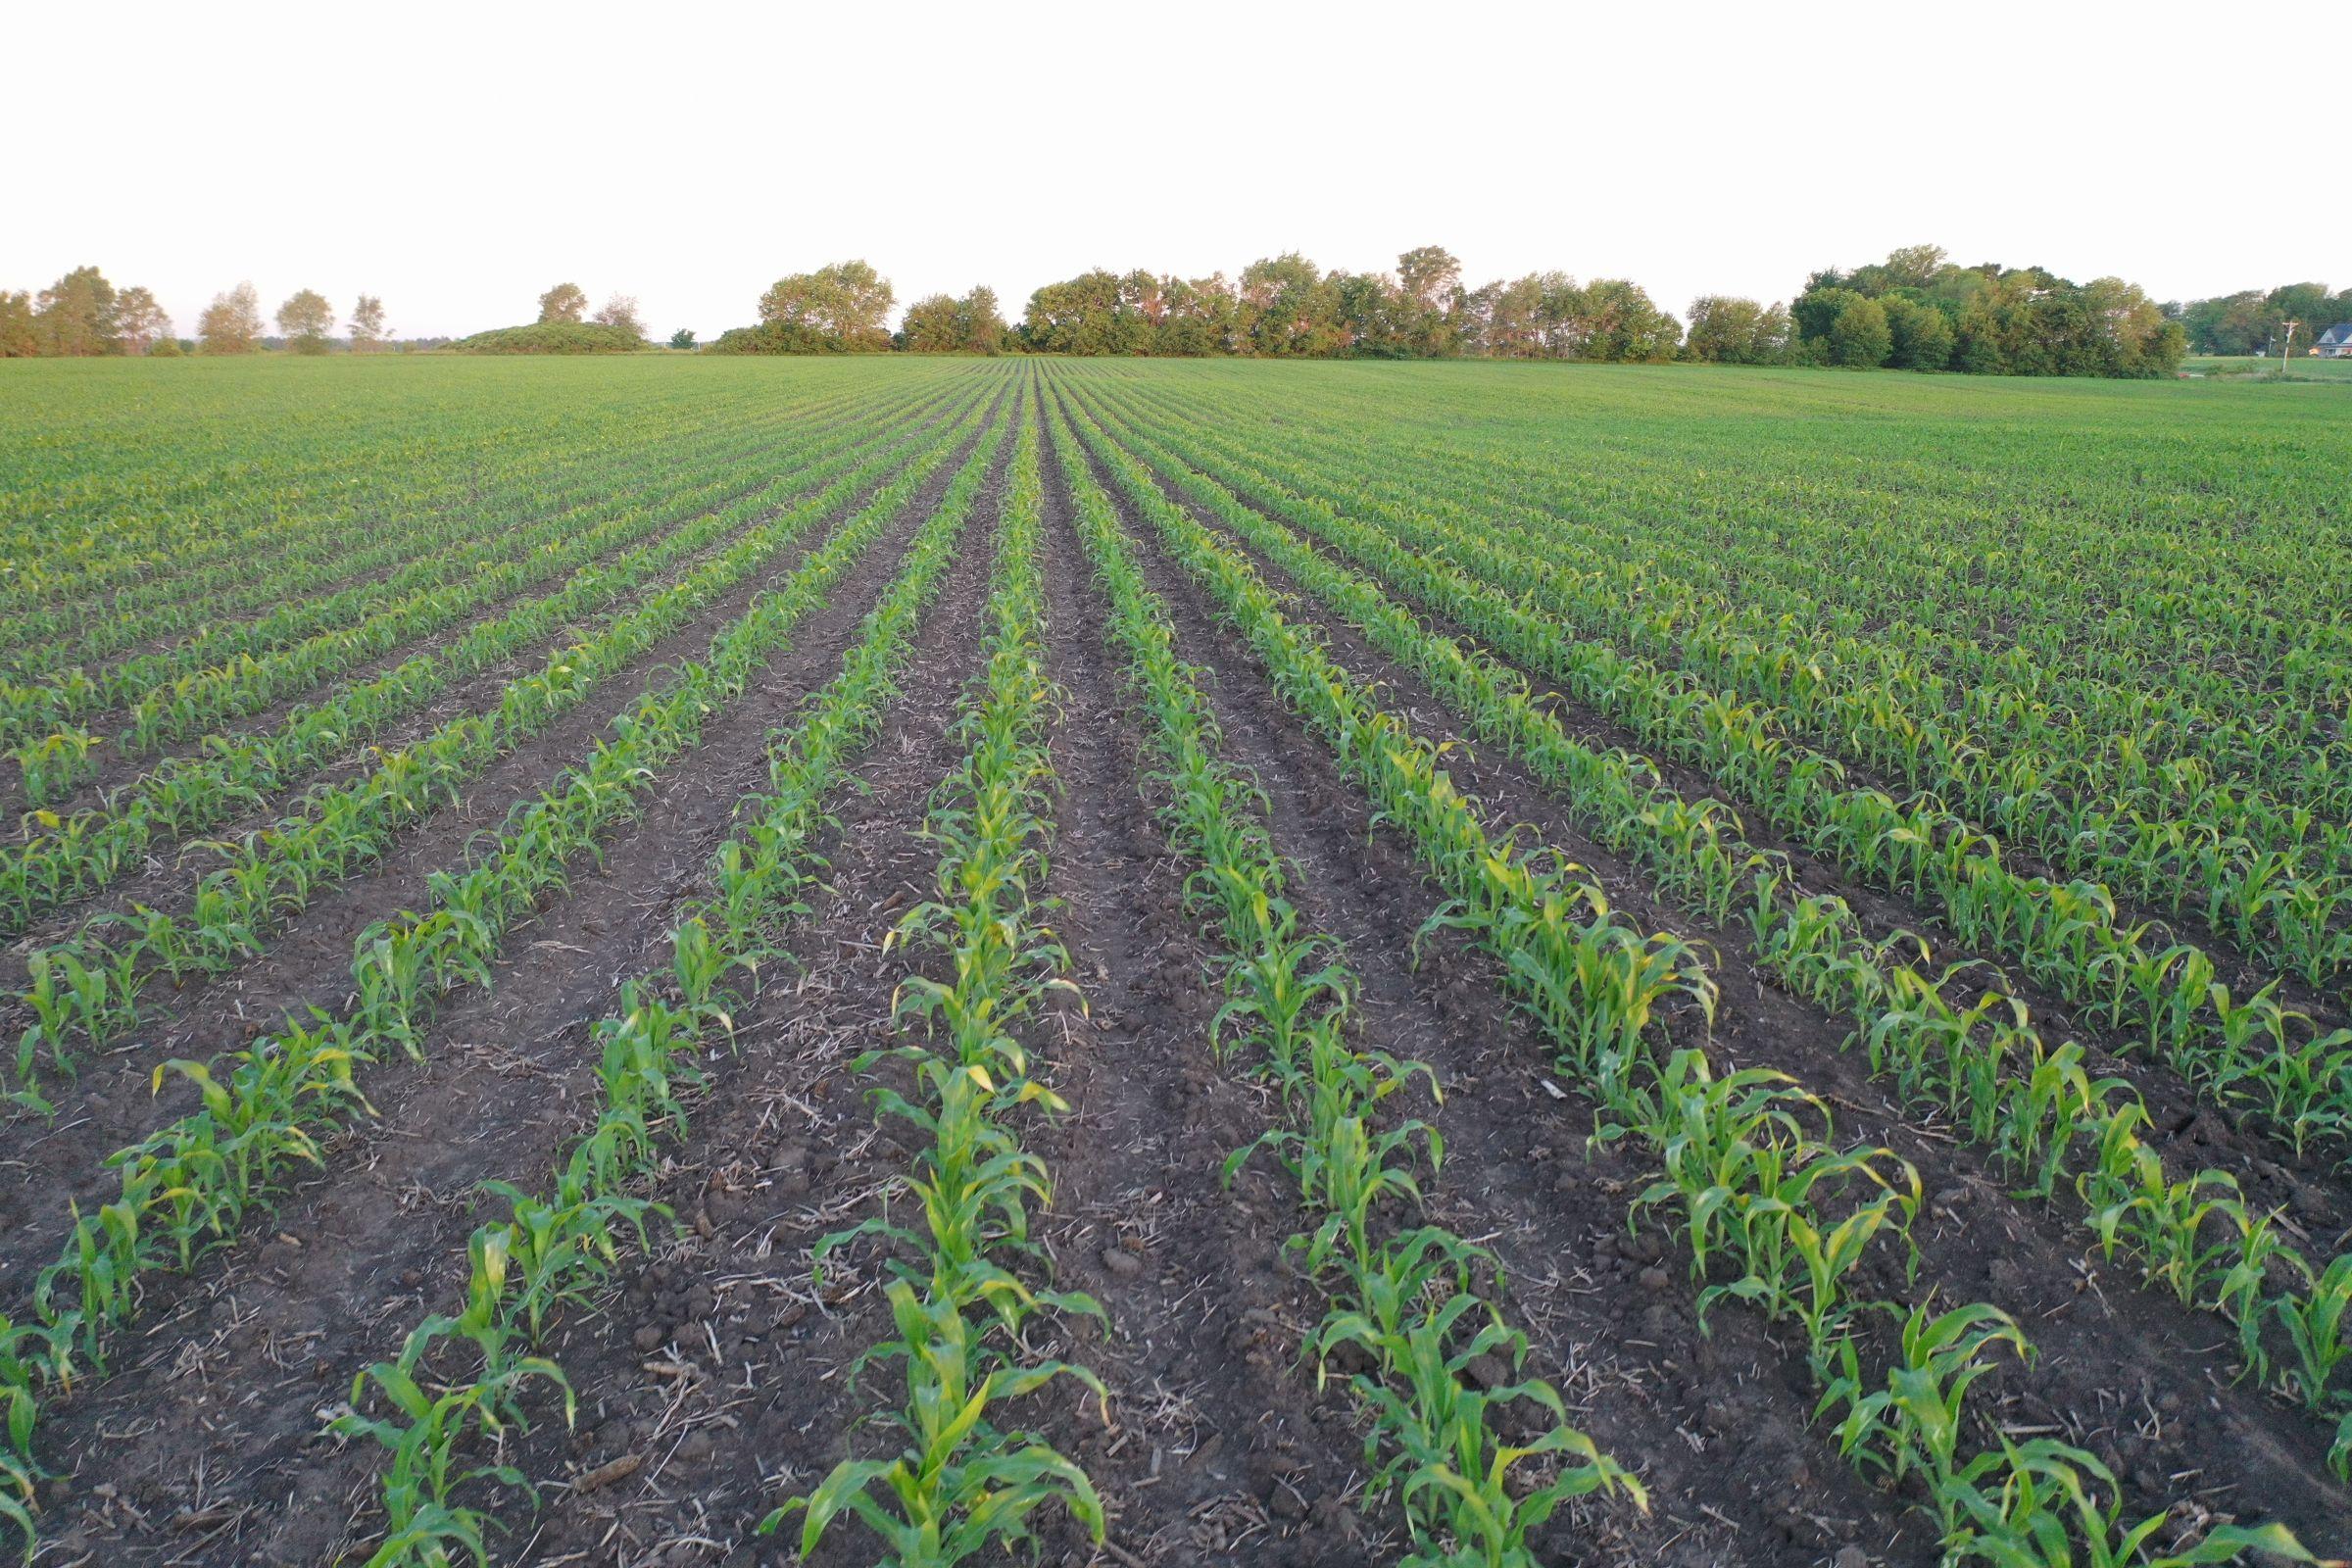 Marion County Iowa Farmland For Sale Auction